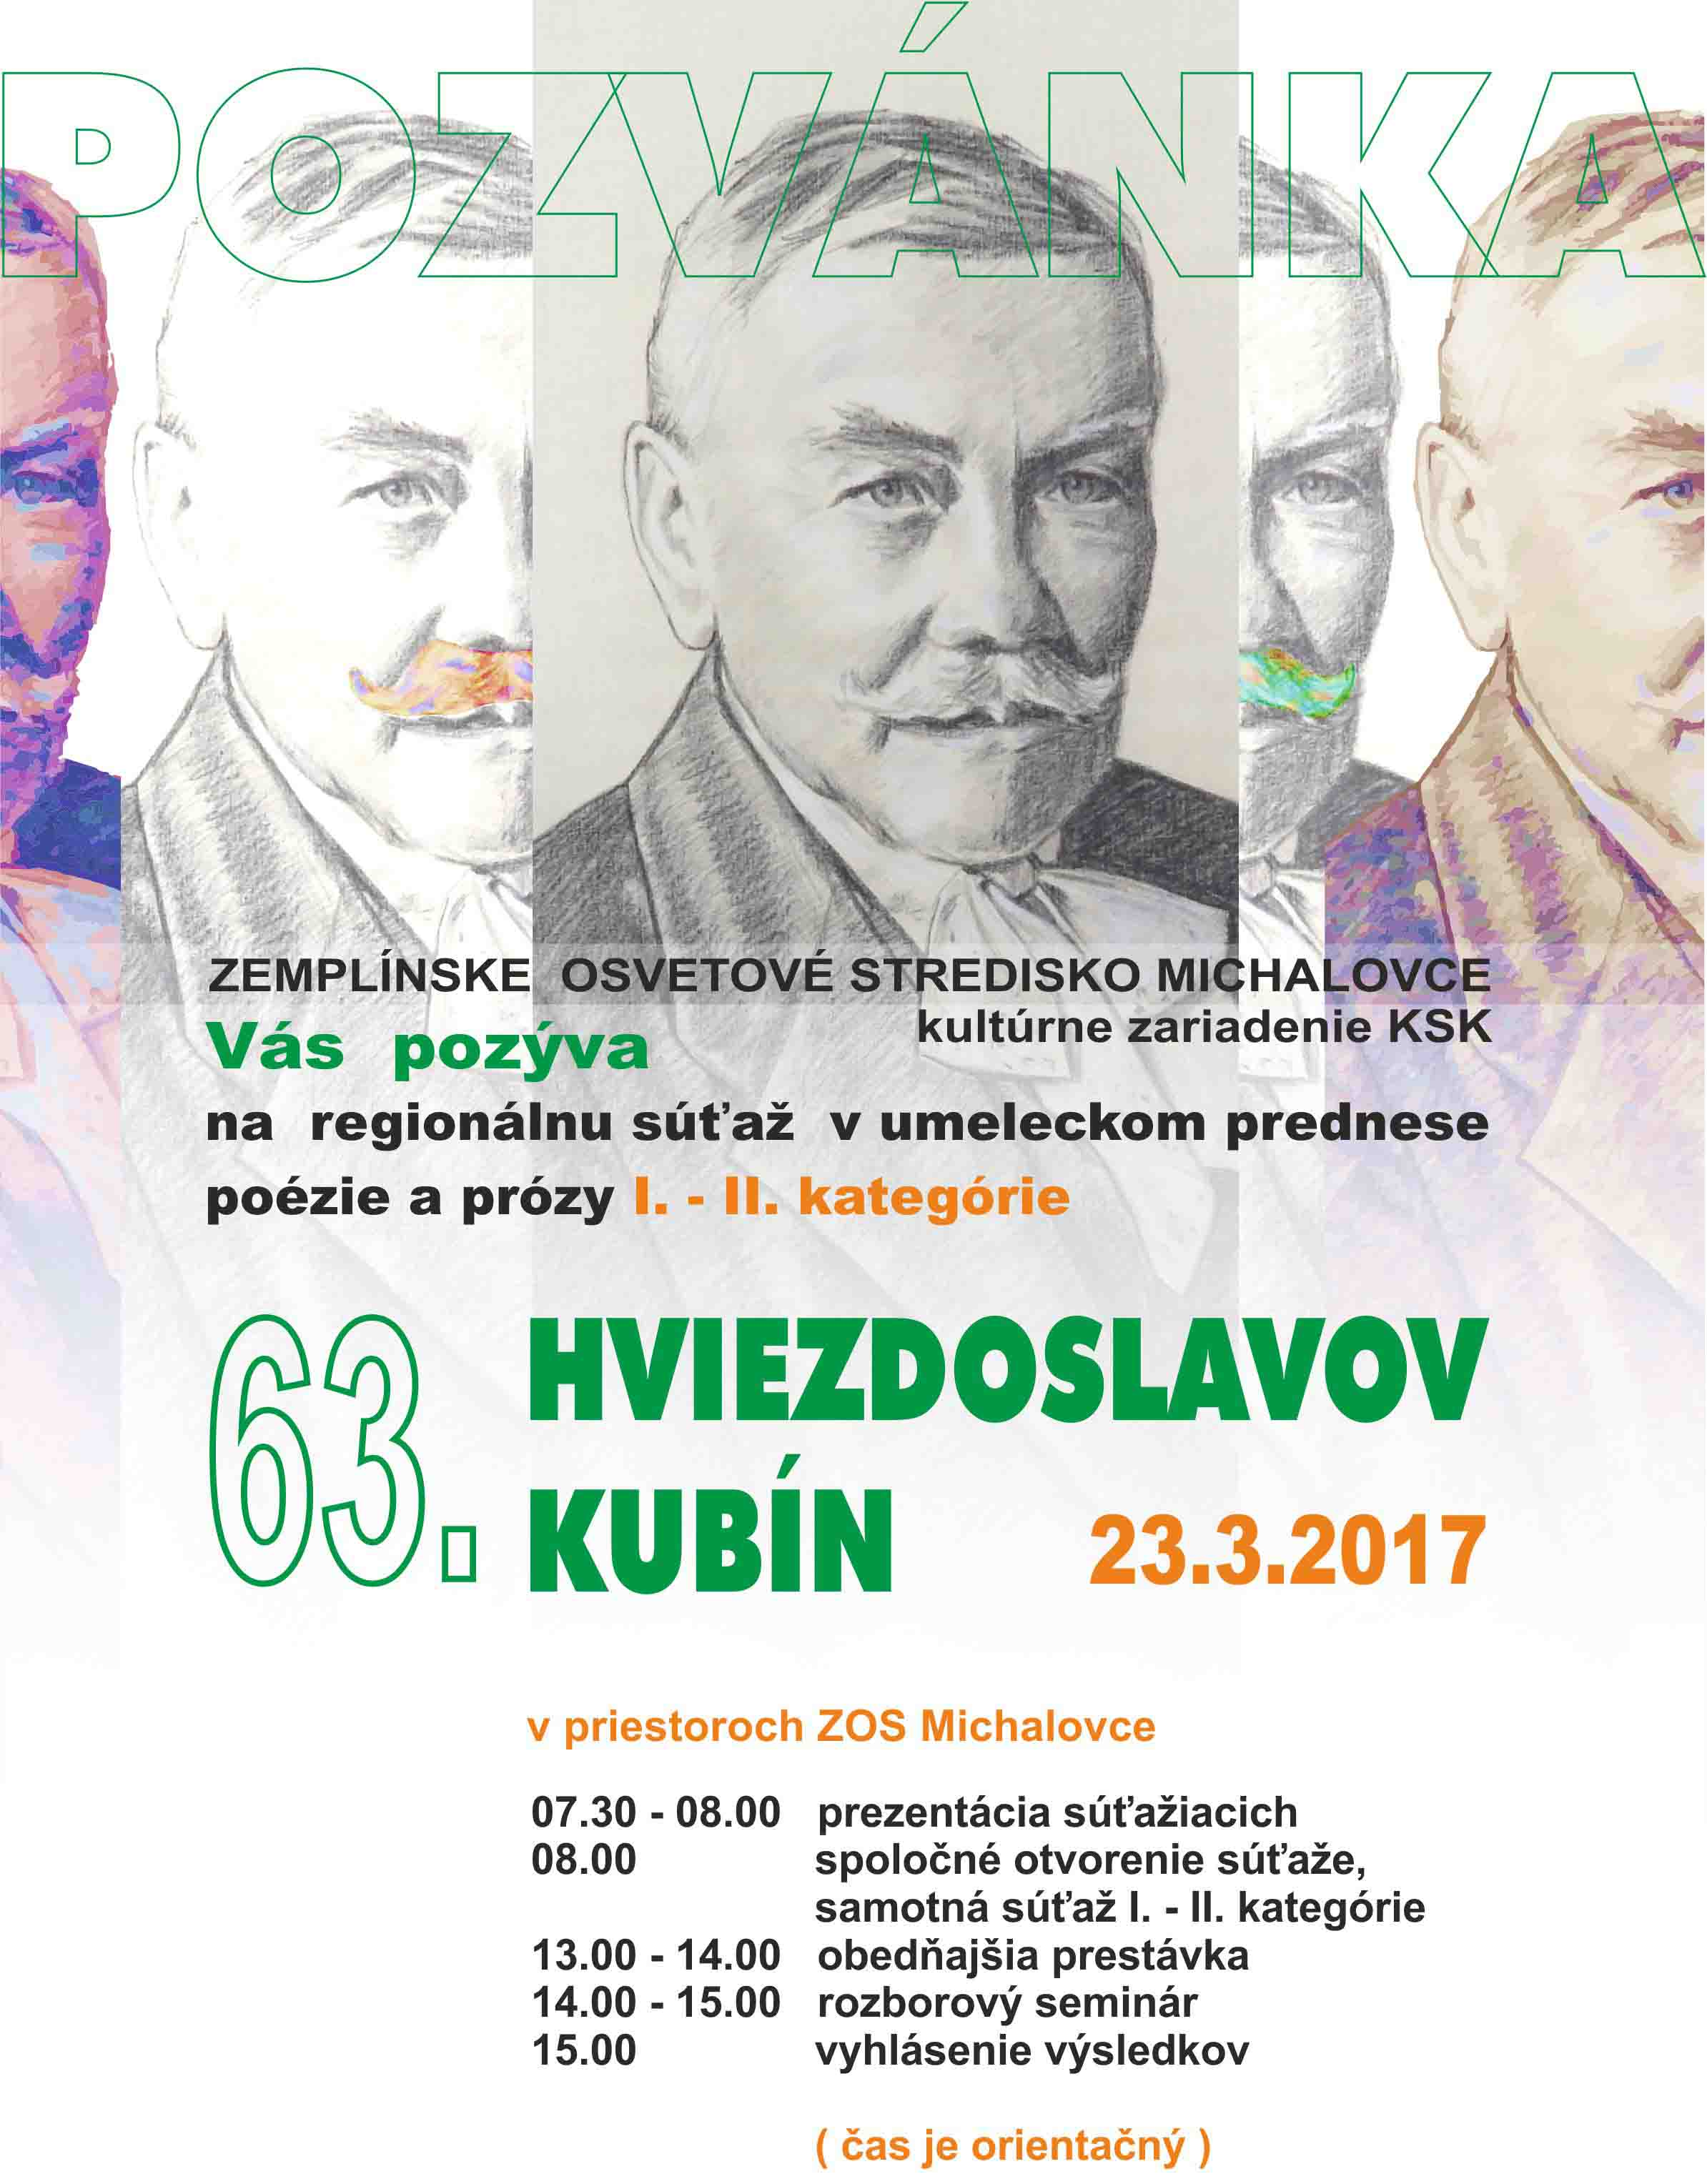 HVIEZDOSLAVOV KUBIN 2017